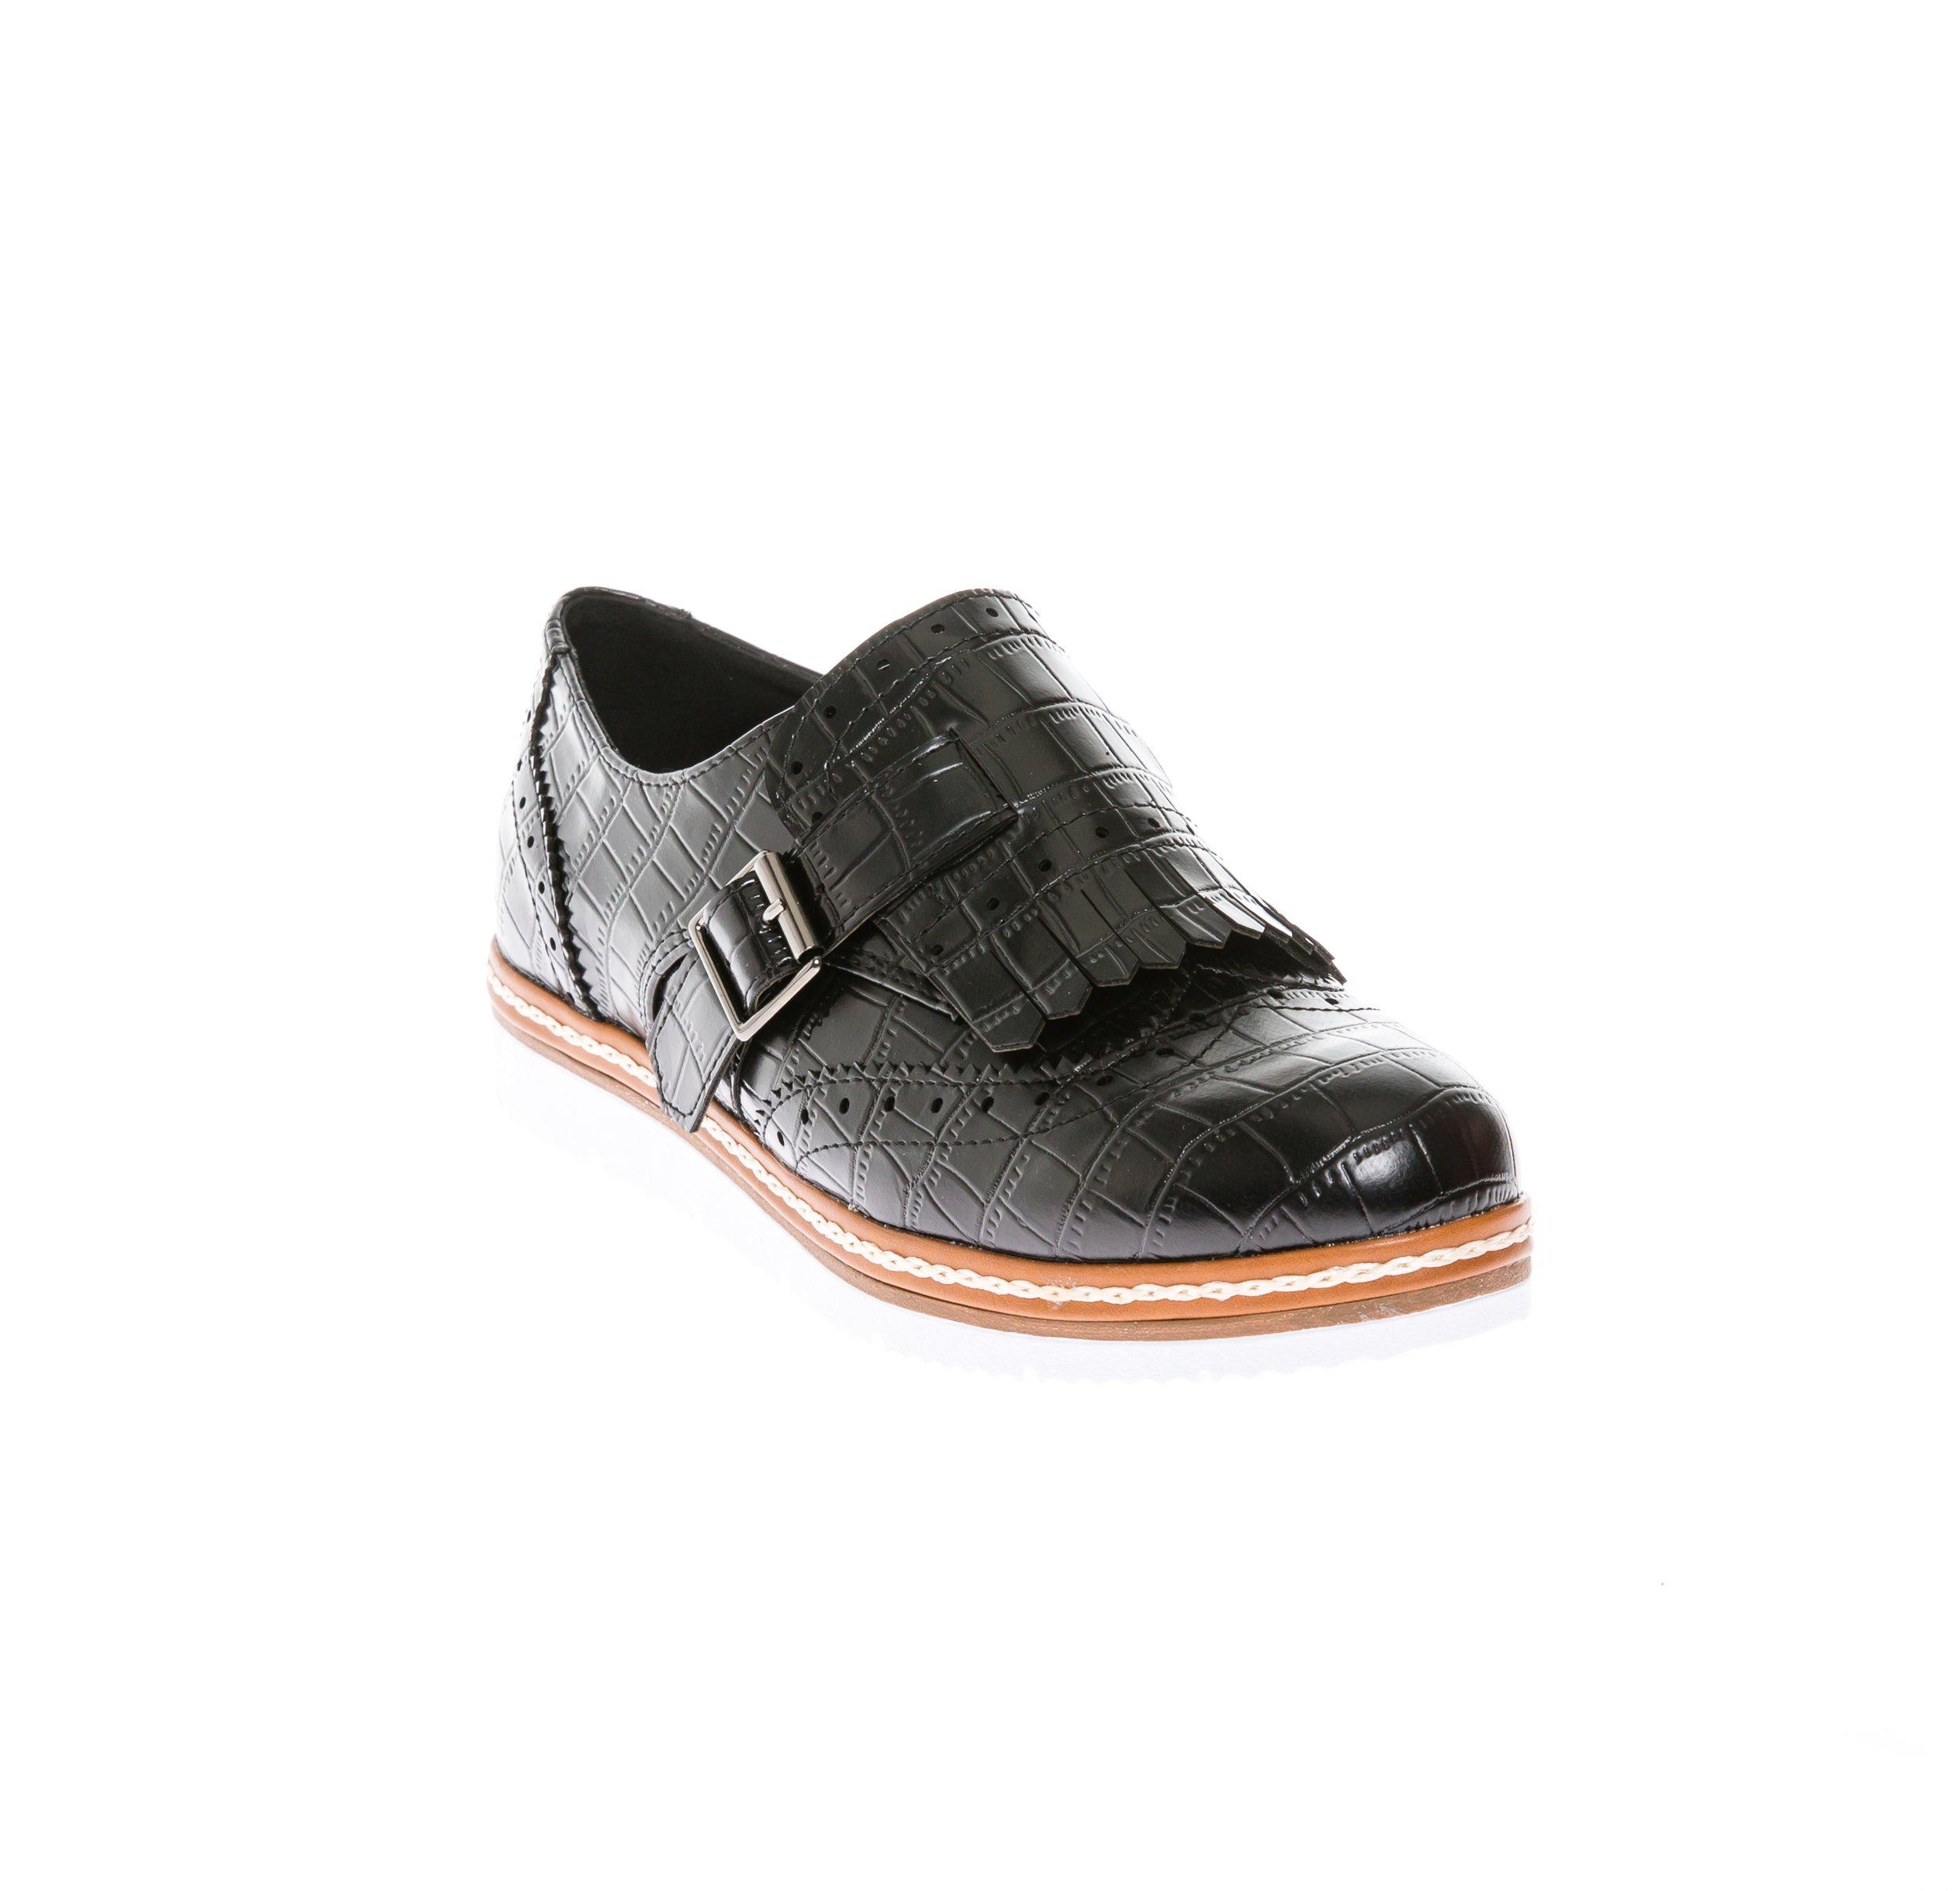 CALICO KIKI Women's Casual Oxford Comfort Flat Shoes (9 US Black)